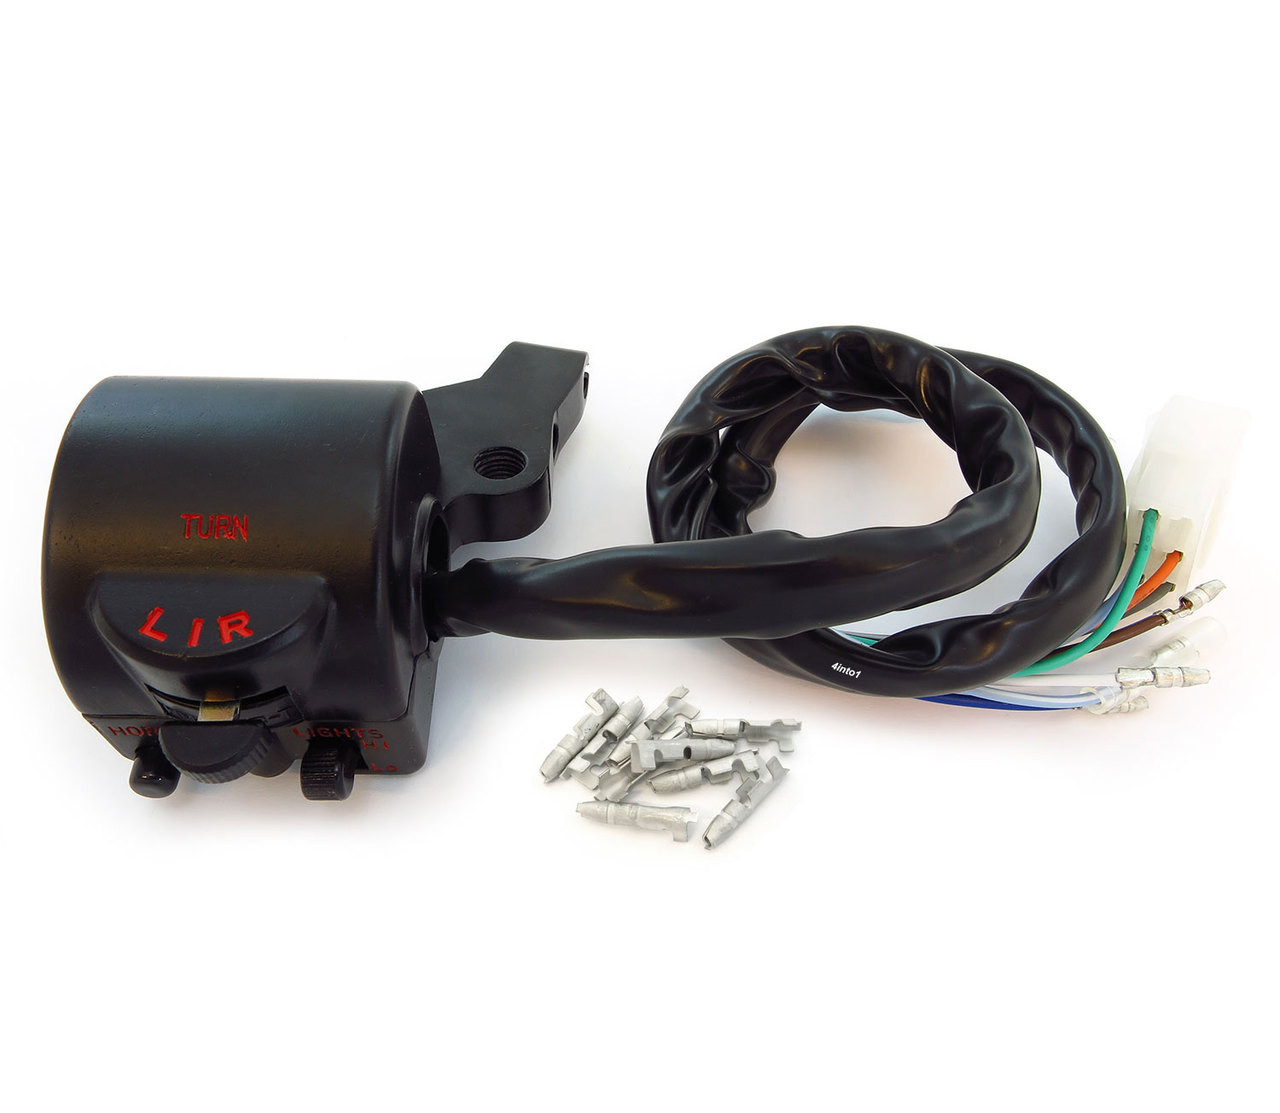 Honda Left Clutch Side Handlebar Switch Assy CB360T CL360 CB400F 35200-377-003